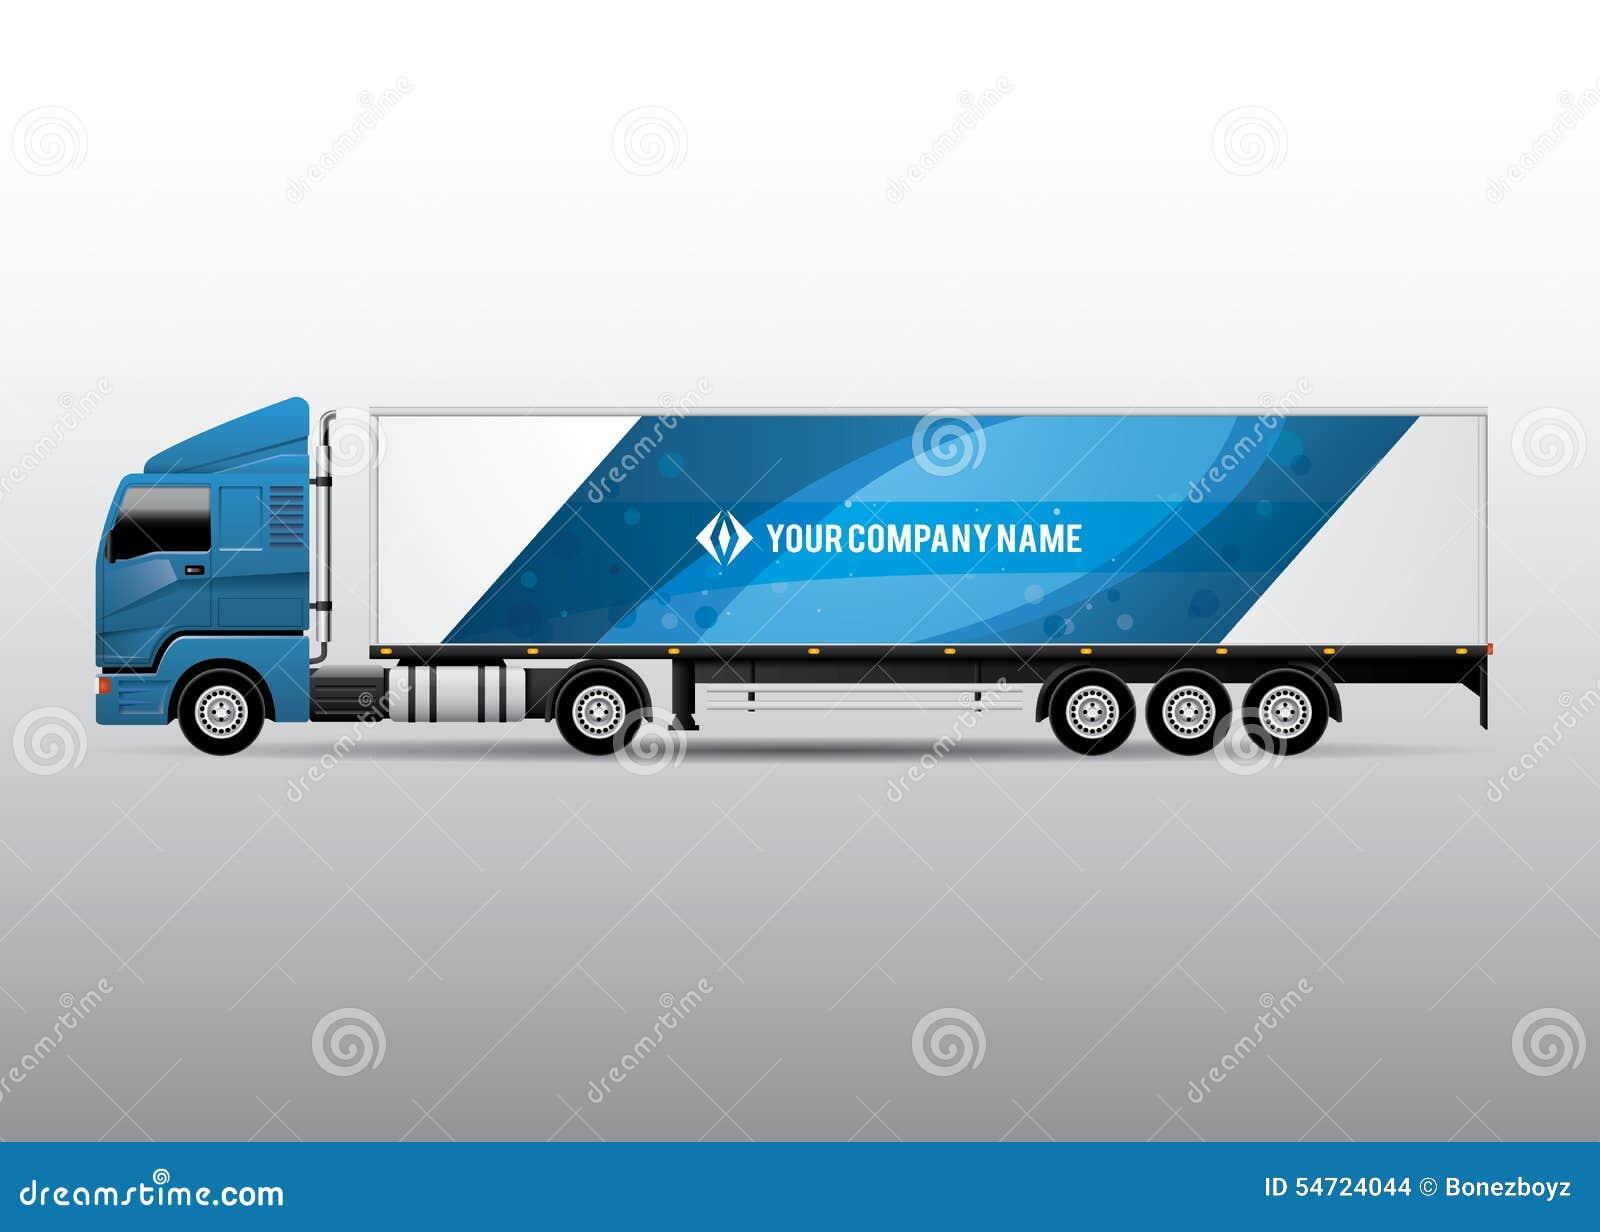 Caminhão do Semirreboque - projeto da propaganda e da identidade corporativa